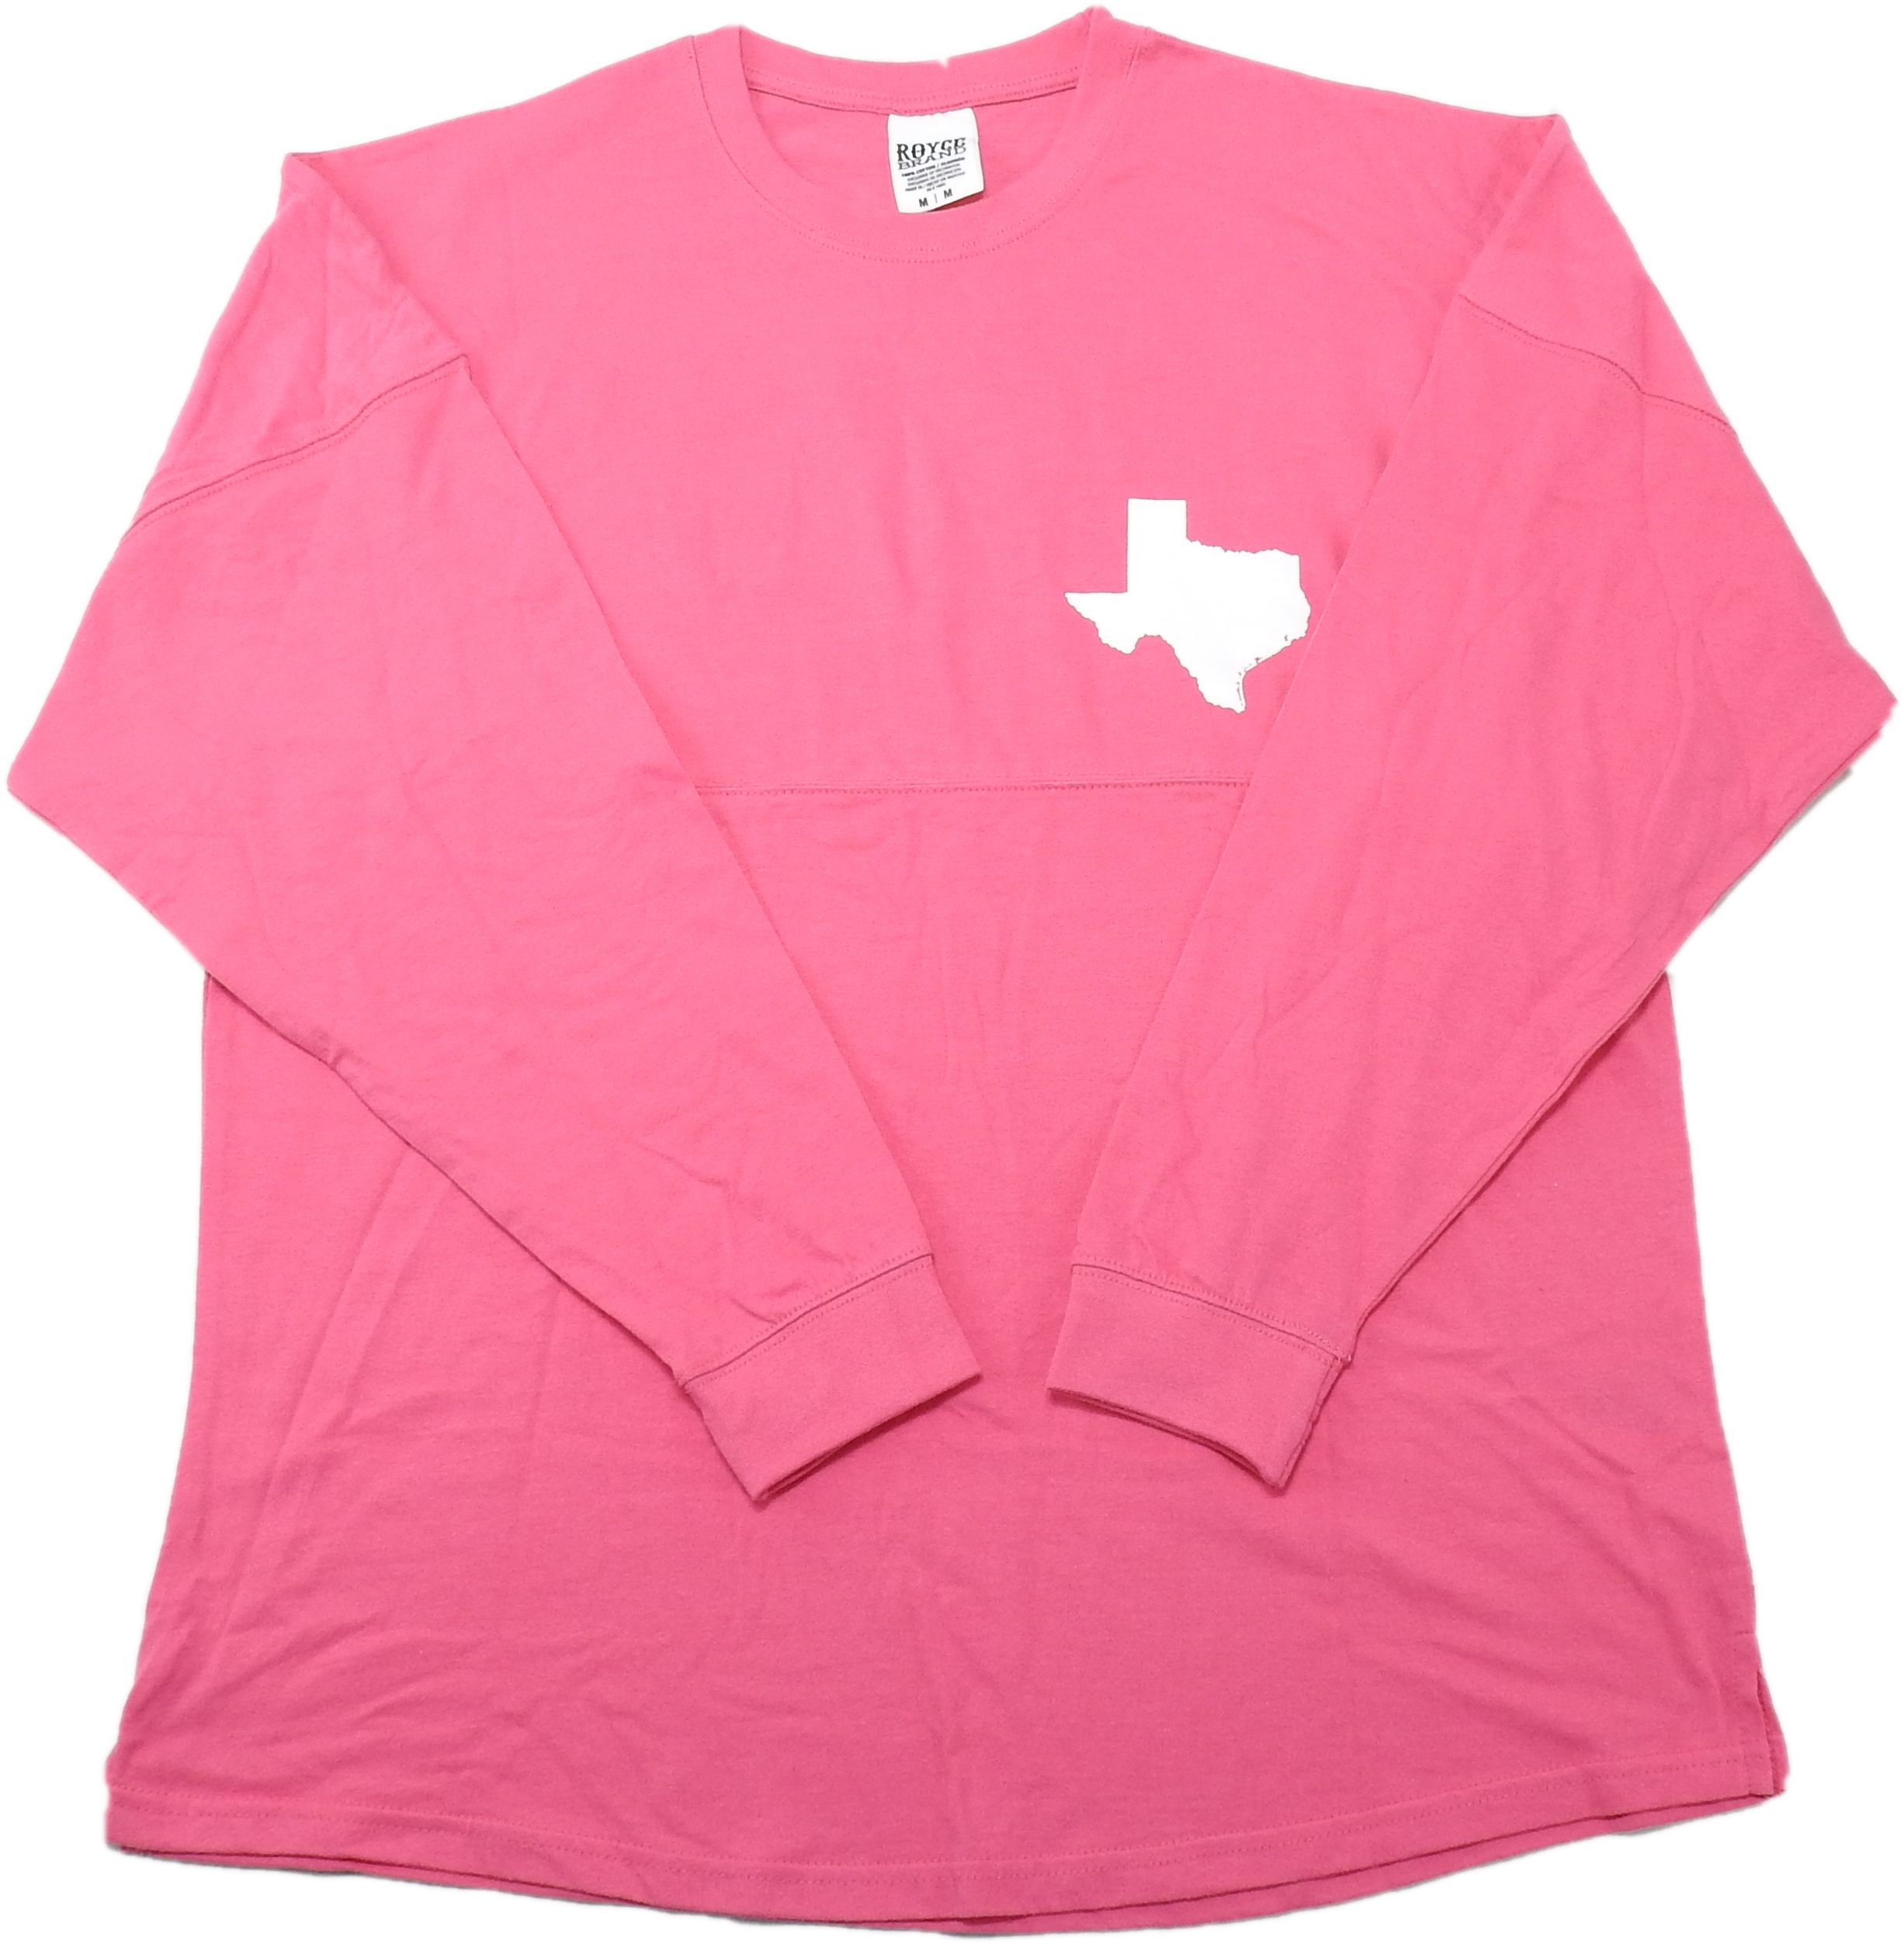 TEXAS Crunchberry ROYCE brand Ladies Long Sleeve Tshirt NEW